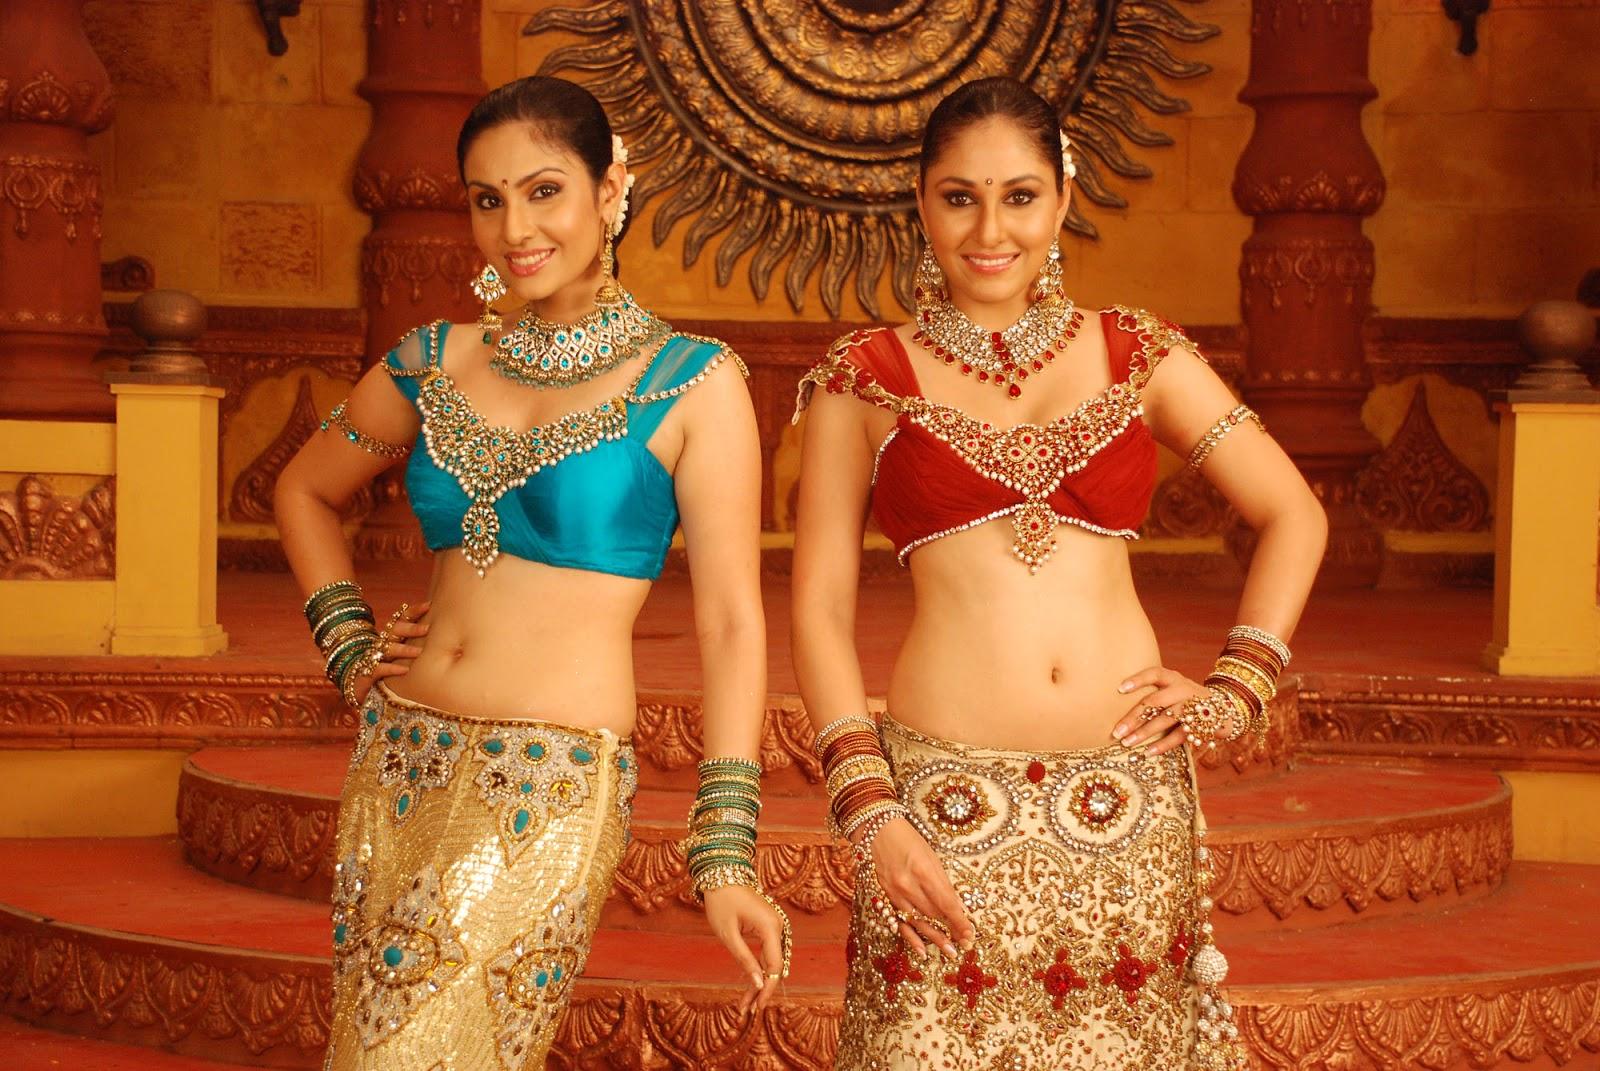 ethnic and sparkling Divya parmeshwaran from ponnar shankar